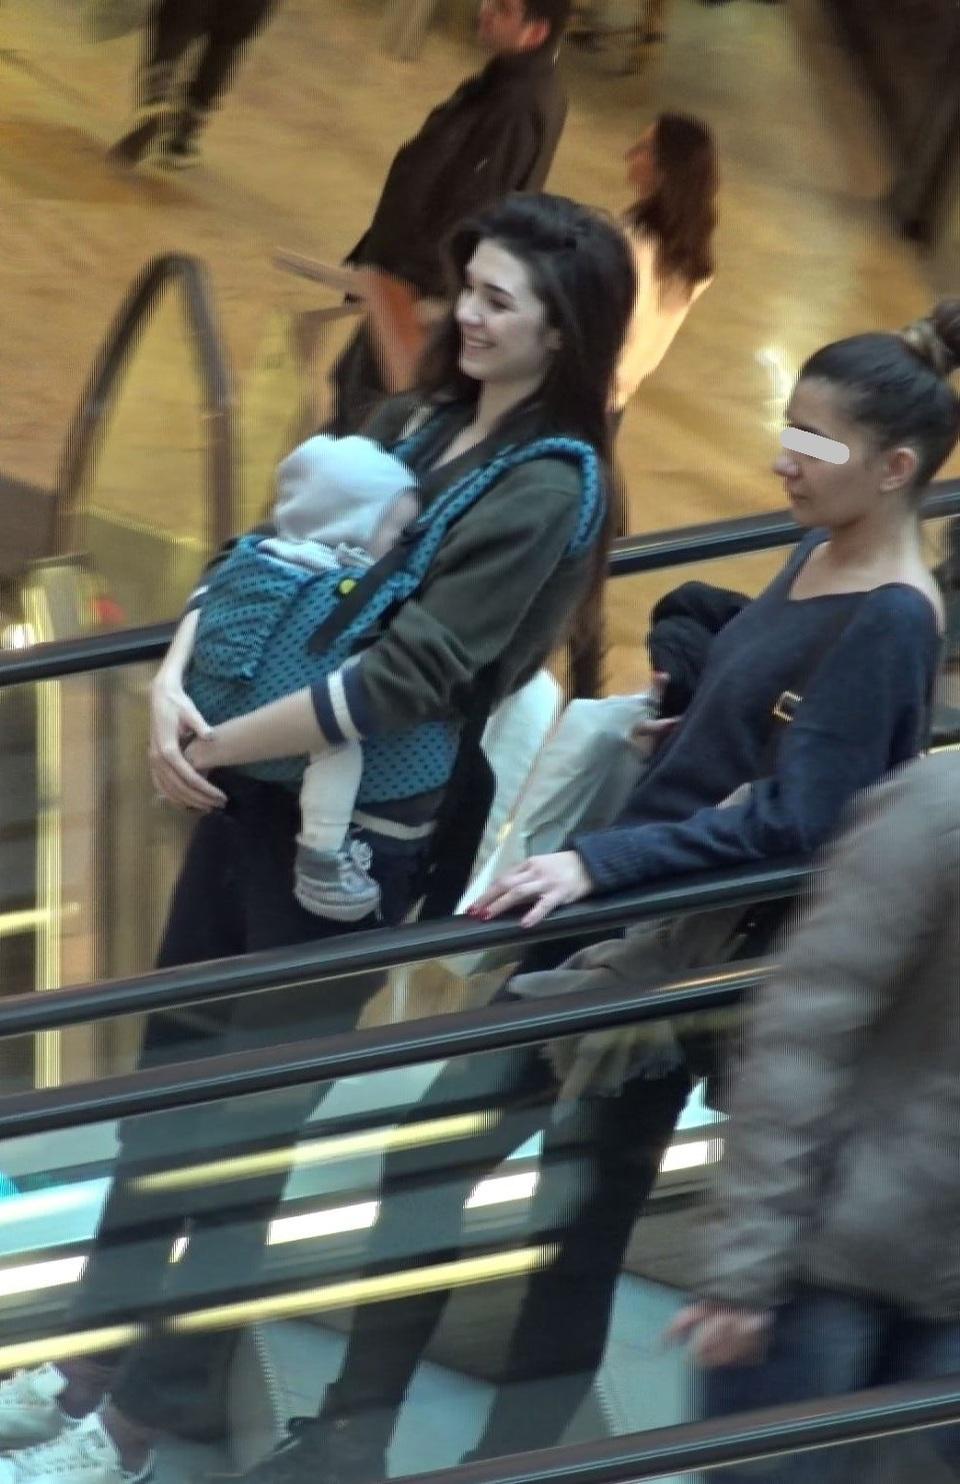 Iubita lui Vladimir Draghia e toata numai zambet, desi barbatul ii e departe! Vedeta tv se lupta in competitia Exatlon, iar Alina se plimba vesela prin mall cu fetita in brate VIDEO EXCLUSIV